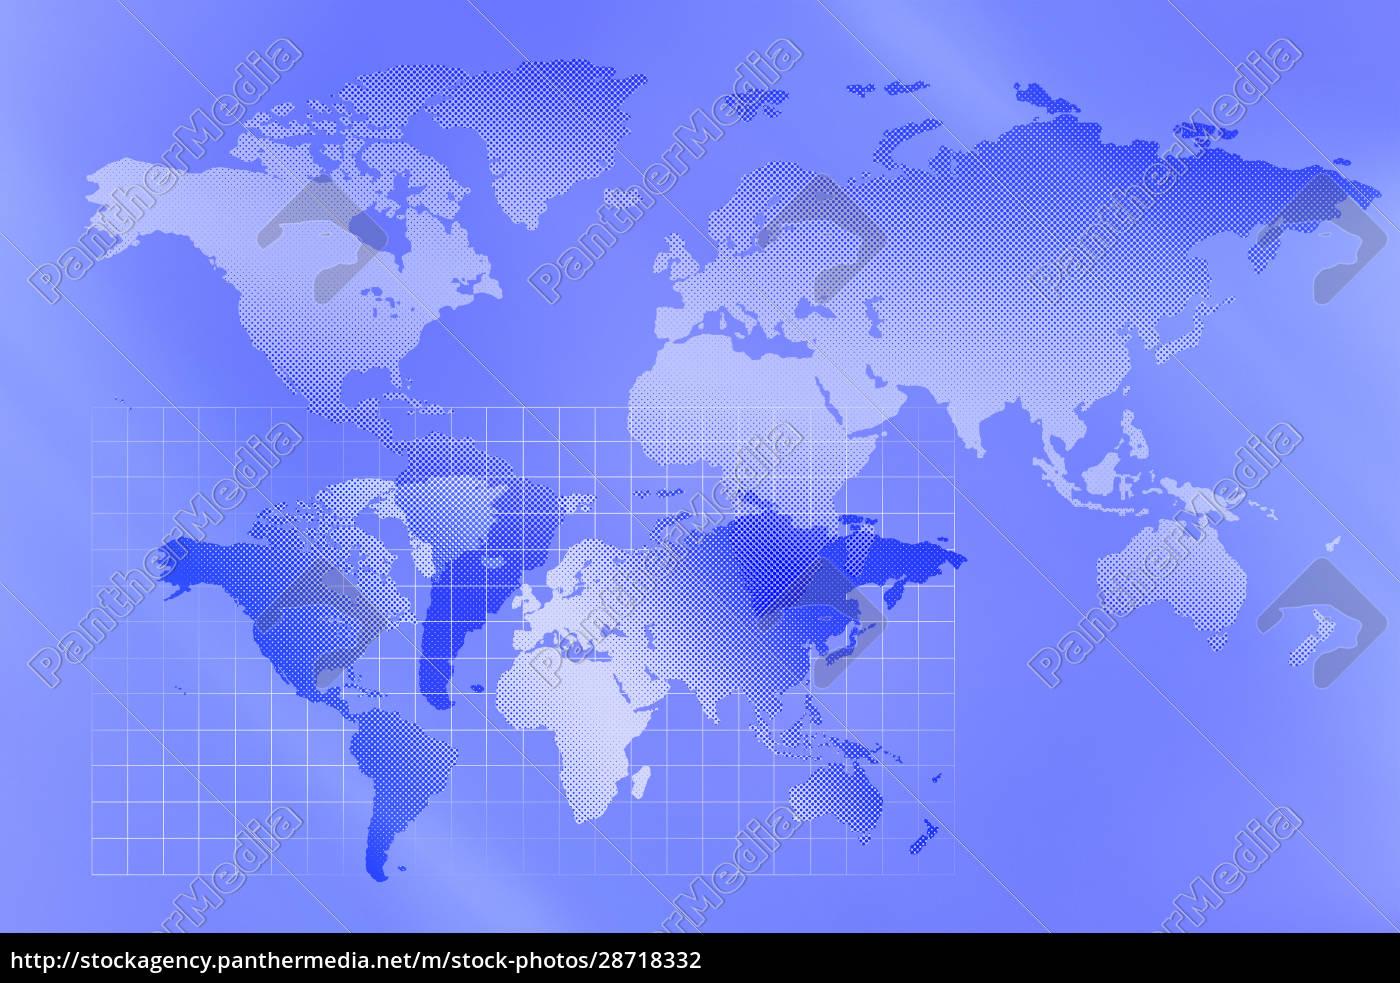 blue, world, map - 28718332